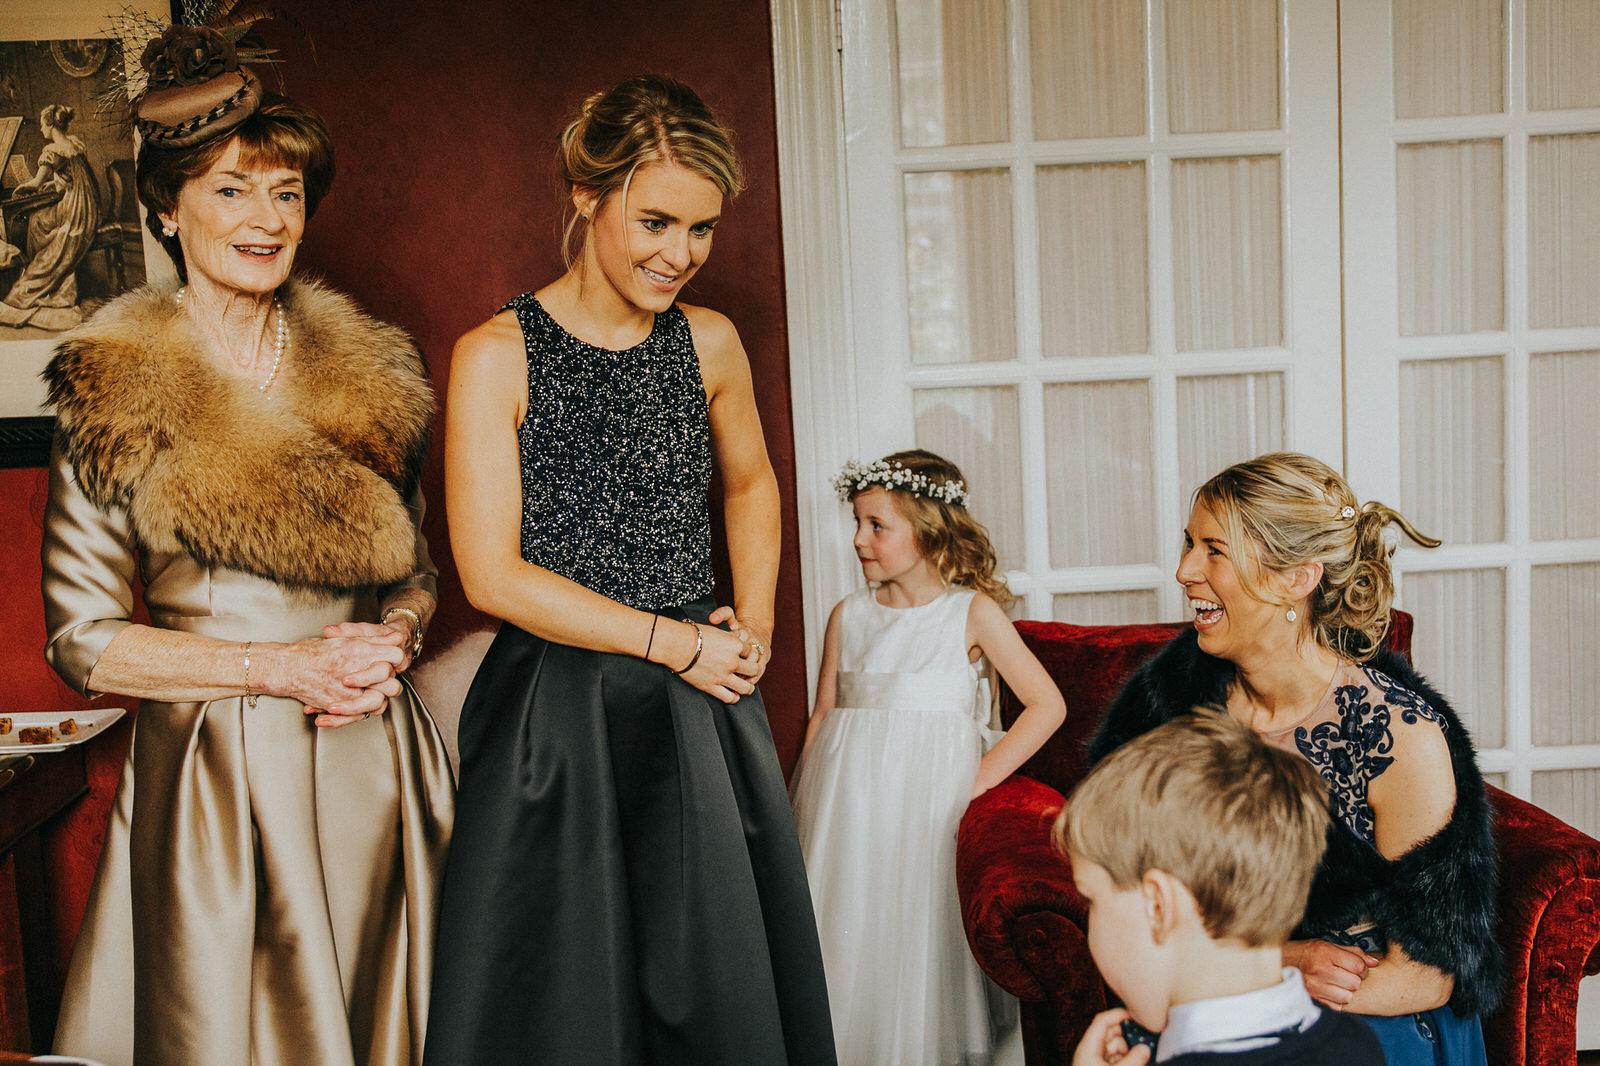 Dunbrody_House_Wedding_photographer_036.jpg